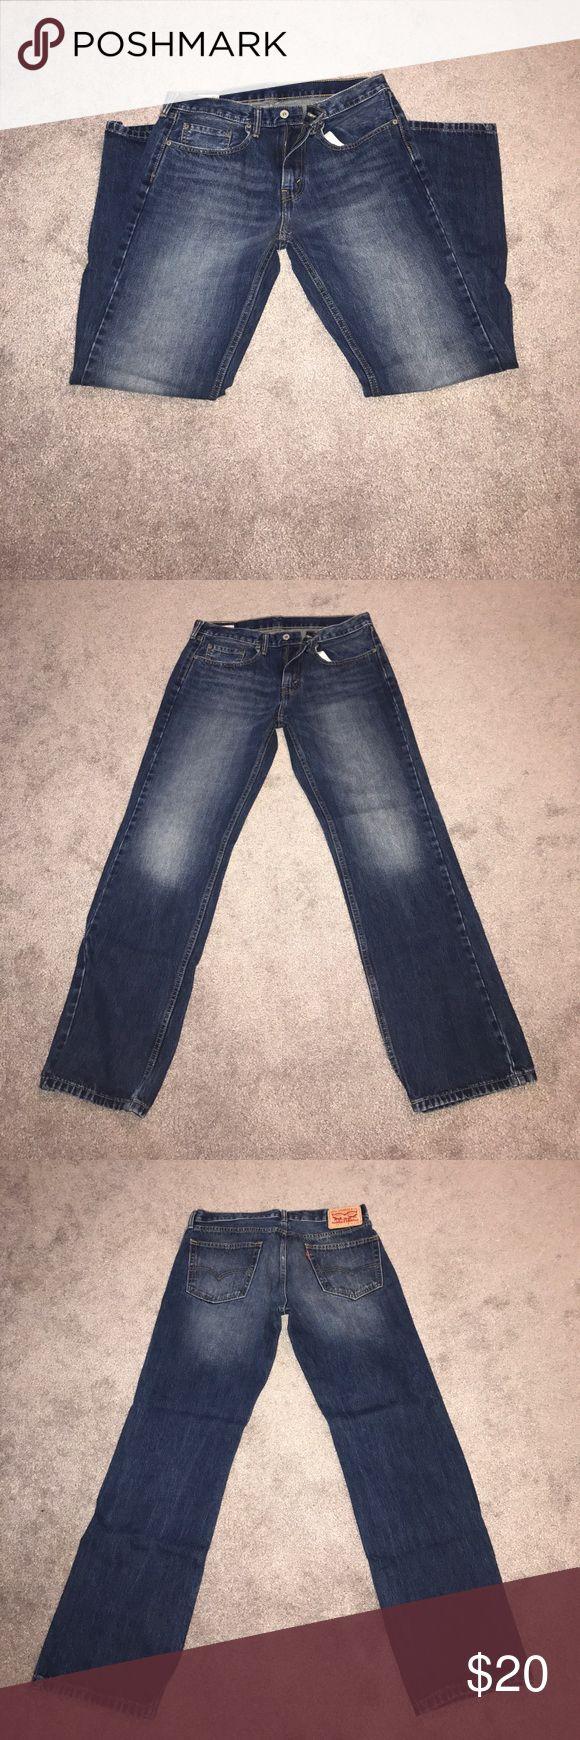 "Men's Levi's ""559"" relaxed jeans Men's sized 32Wx32L, relaxed fit, Levi's ""559"" jeans Levi's Jeans Relaxed"